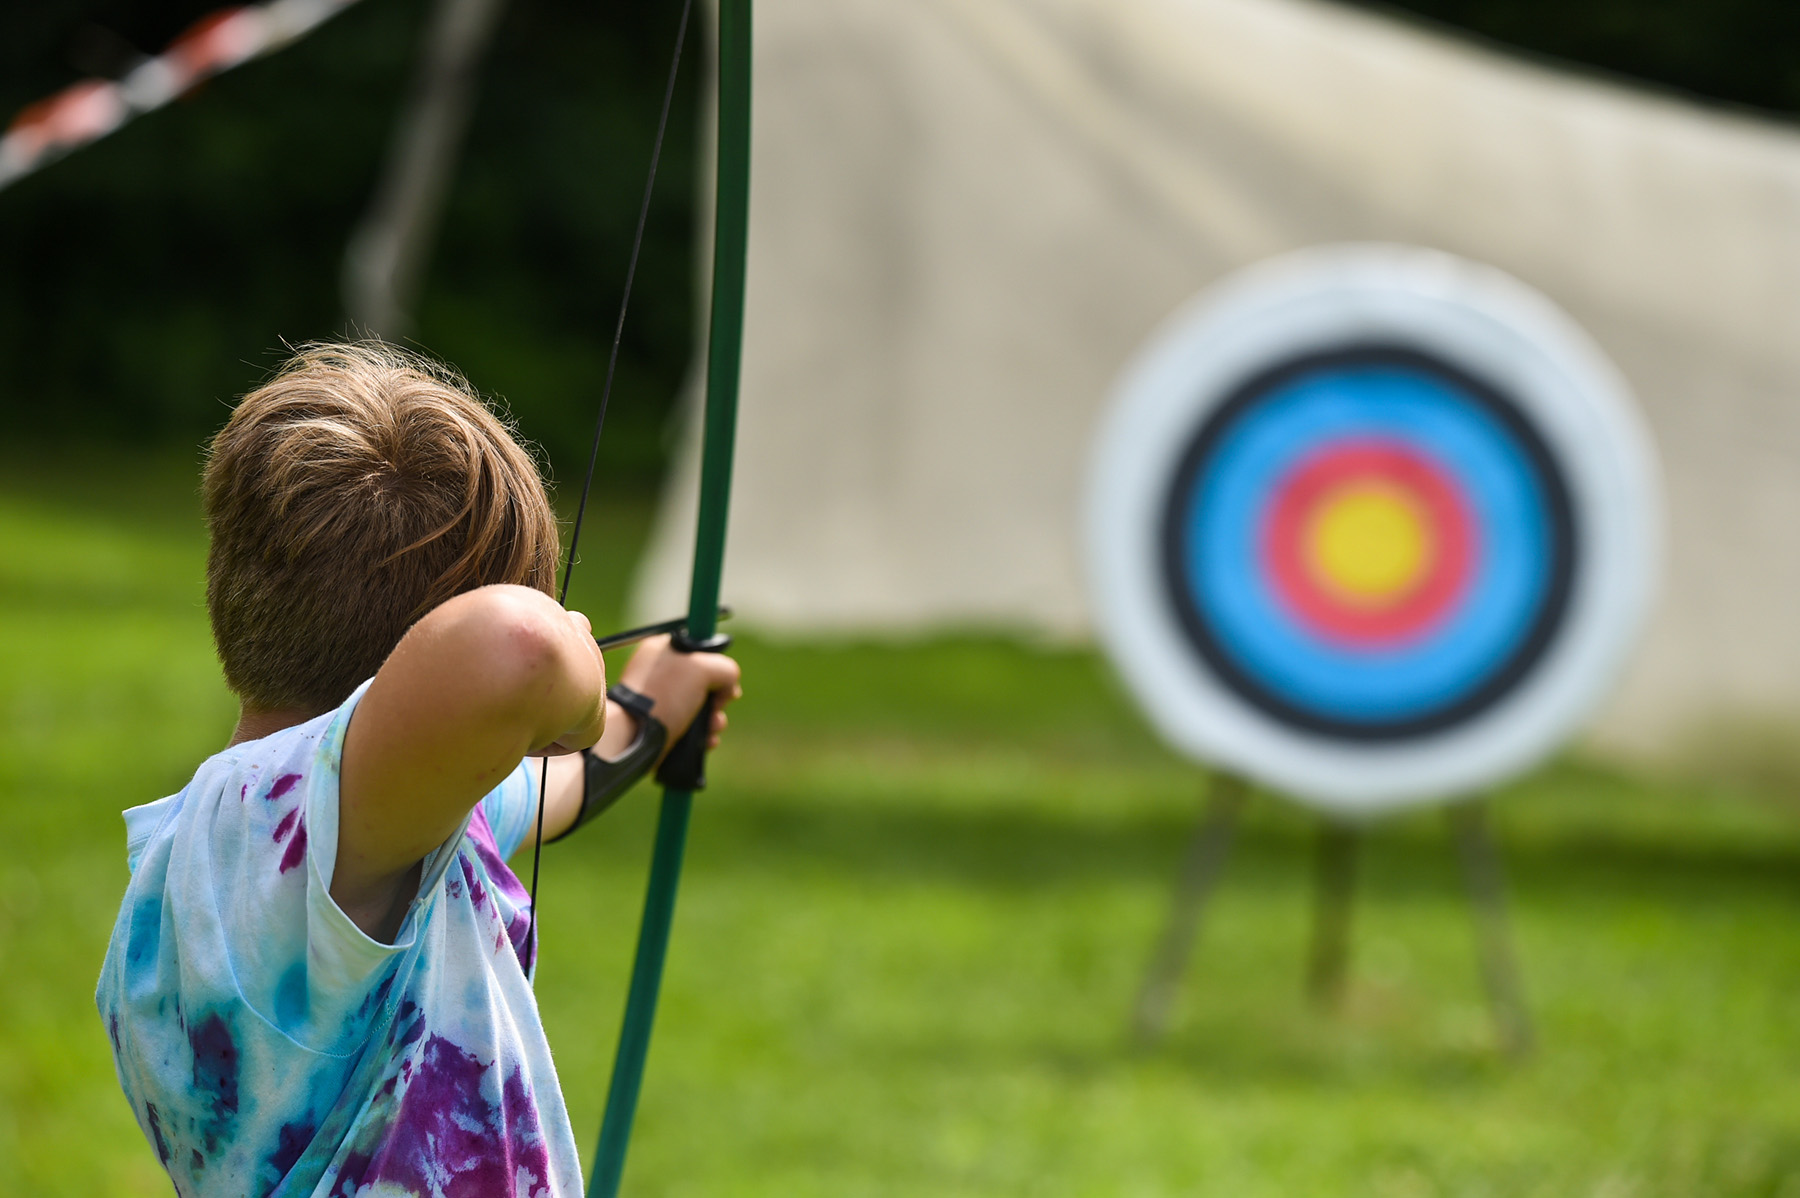 BKLYNER Brings the Summer Camp Fair to you - BKLYNER